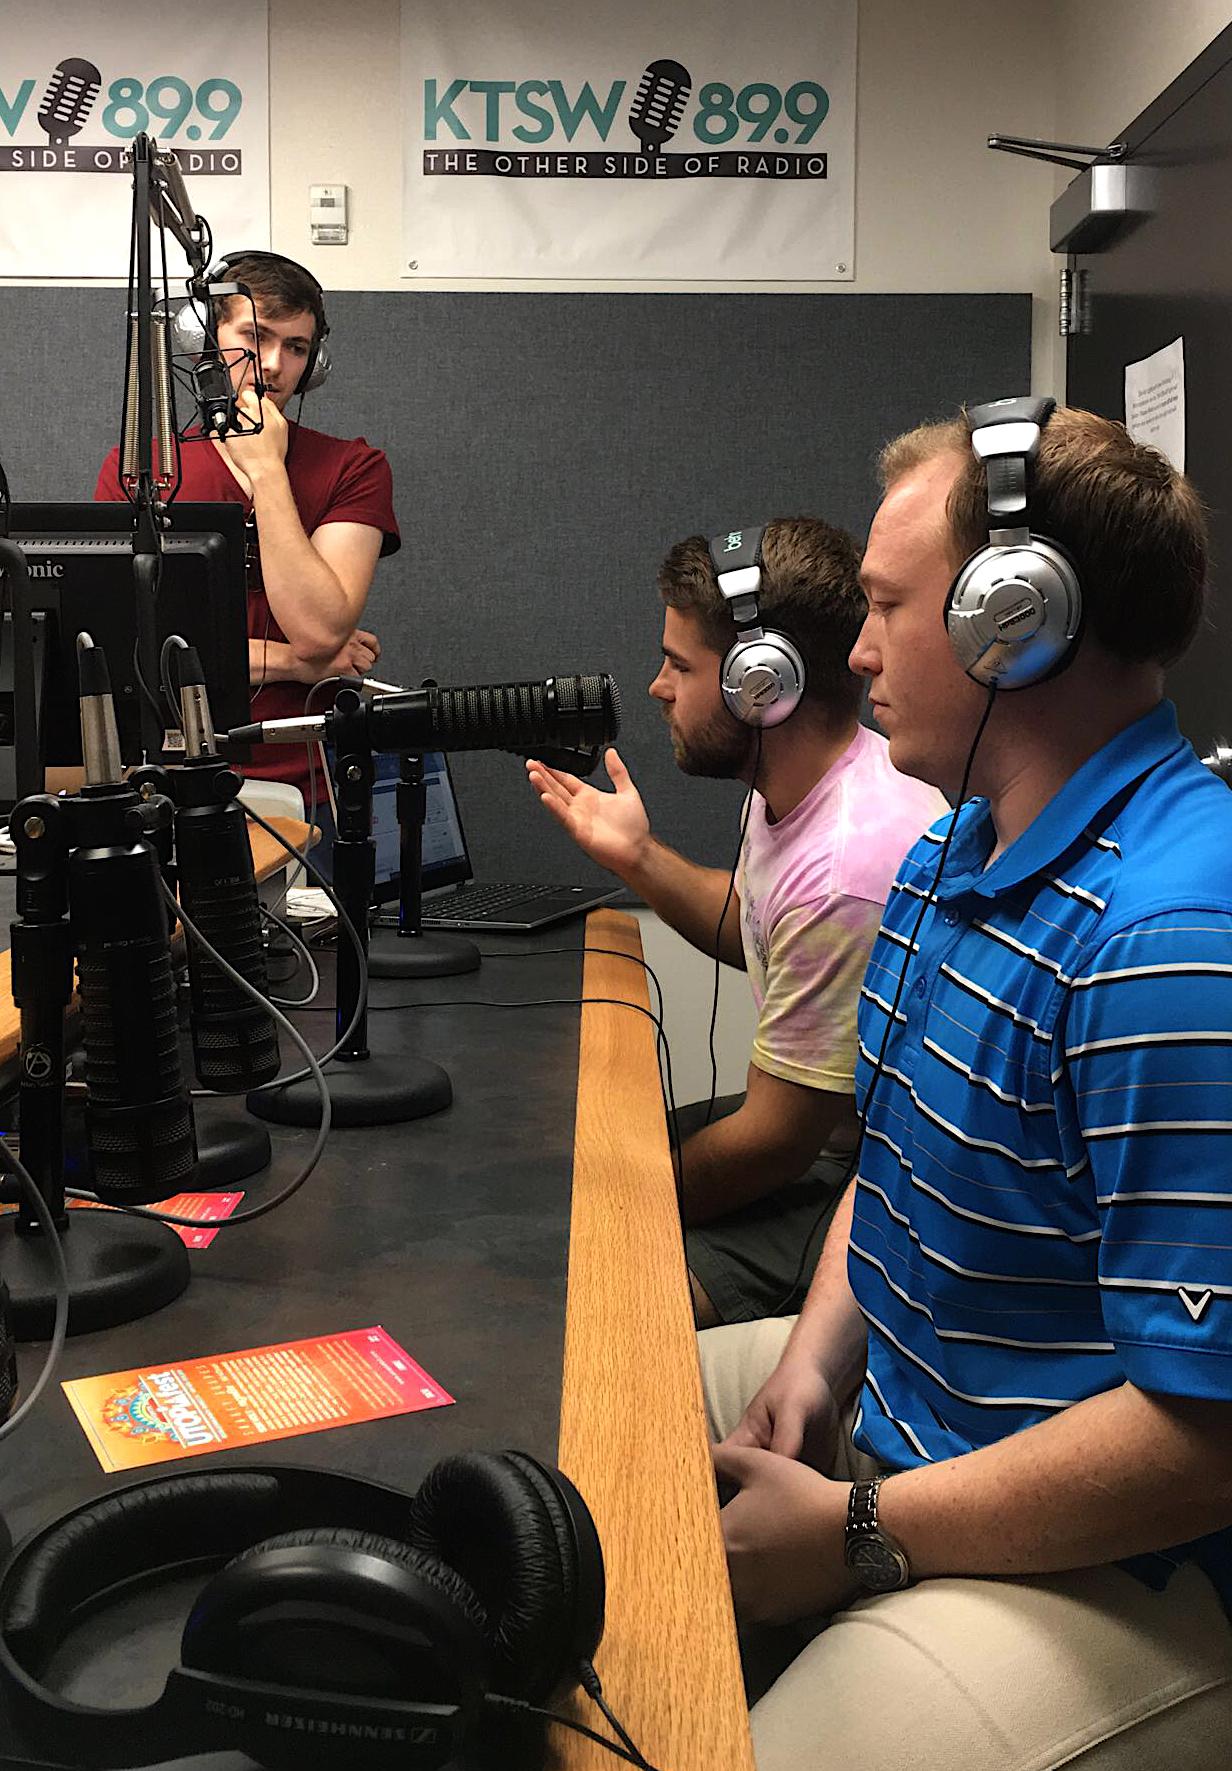 3 KTSW student workers in the studio with headphones on speaking into microphones.